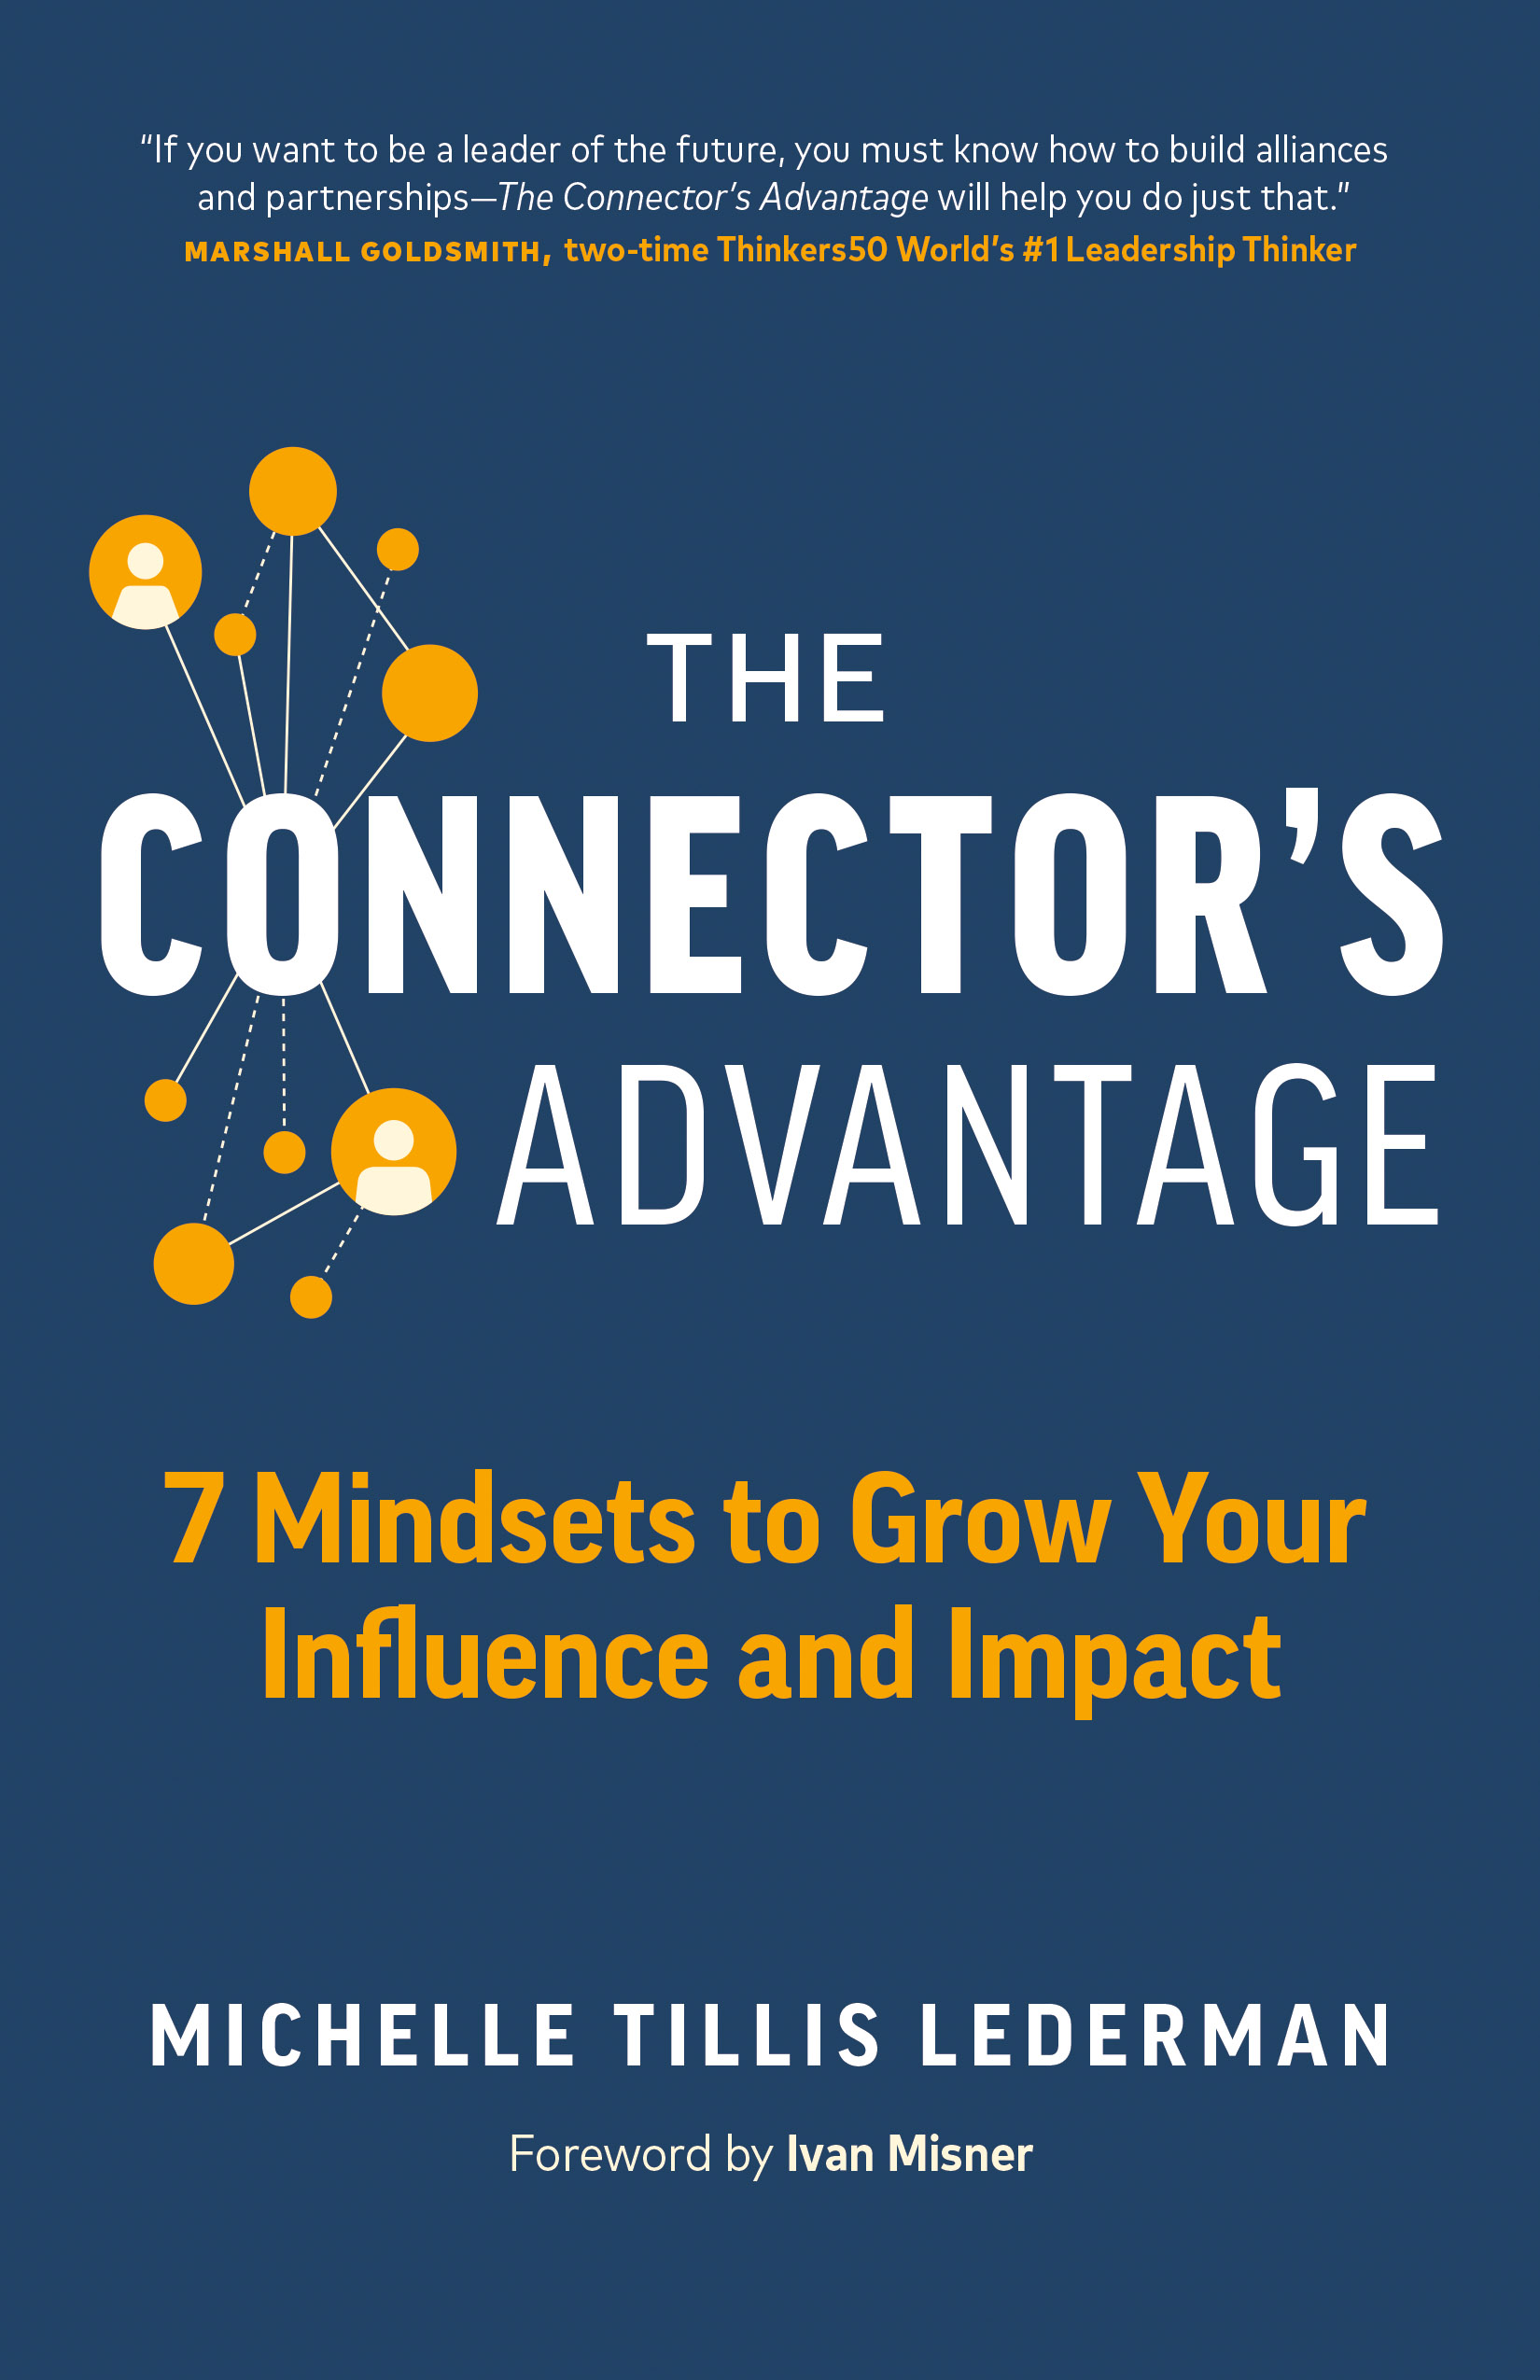 The Connector's Advantage